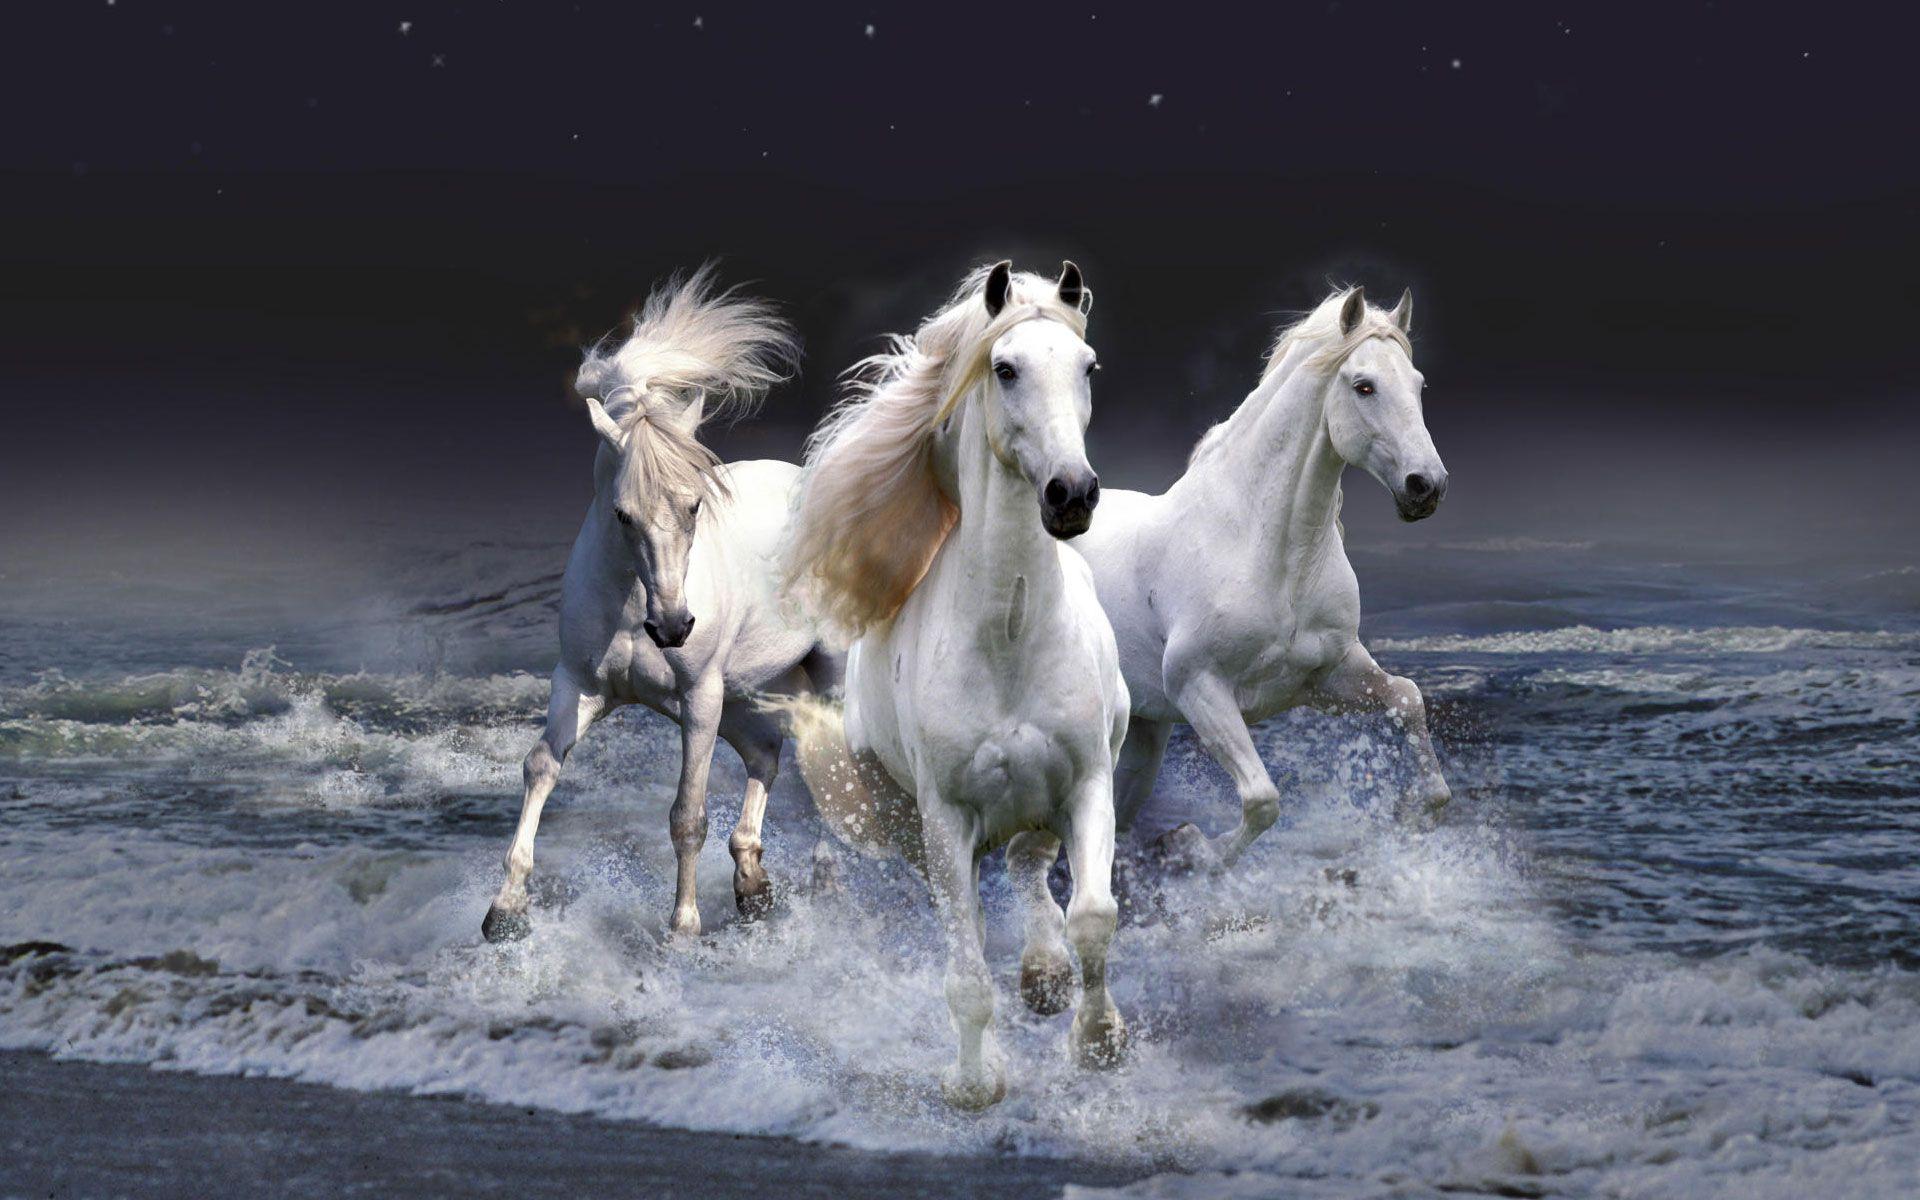 Mystic Horses Wallpapers Hd Wallpapers Horses White Horses Horse Wallpaper